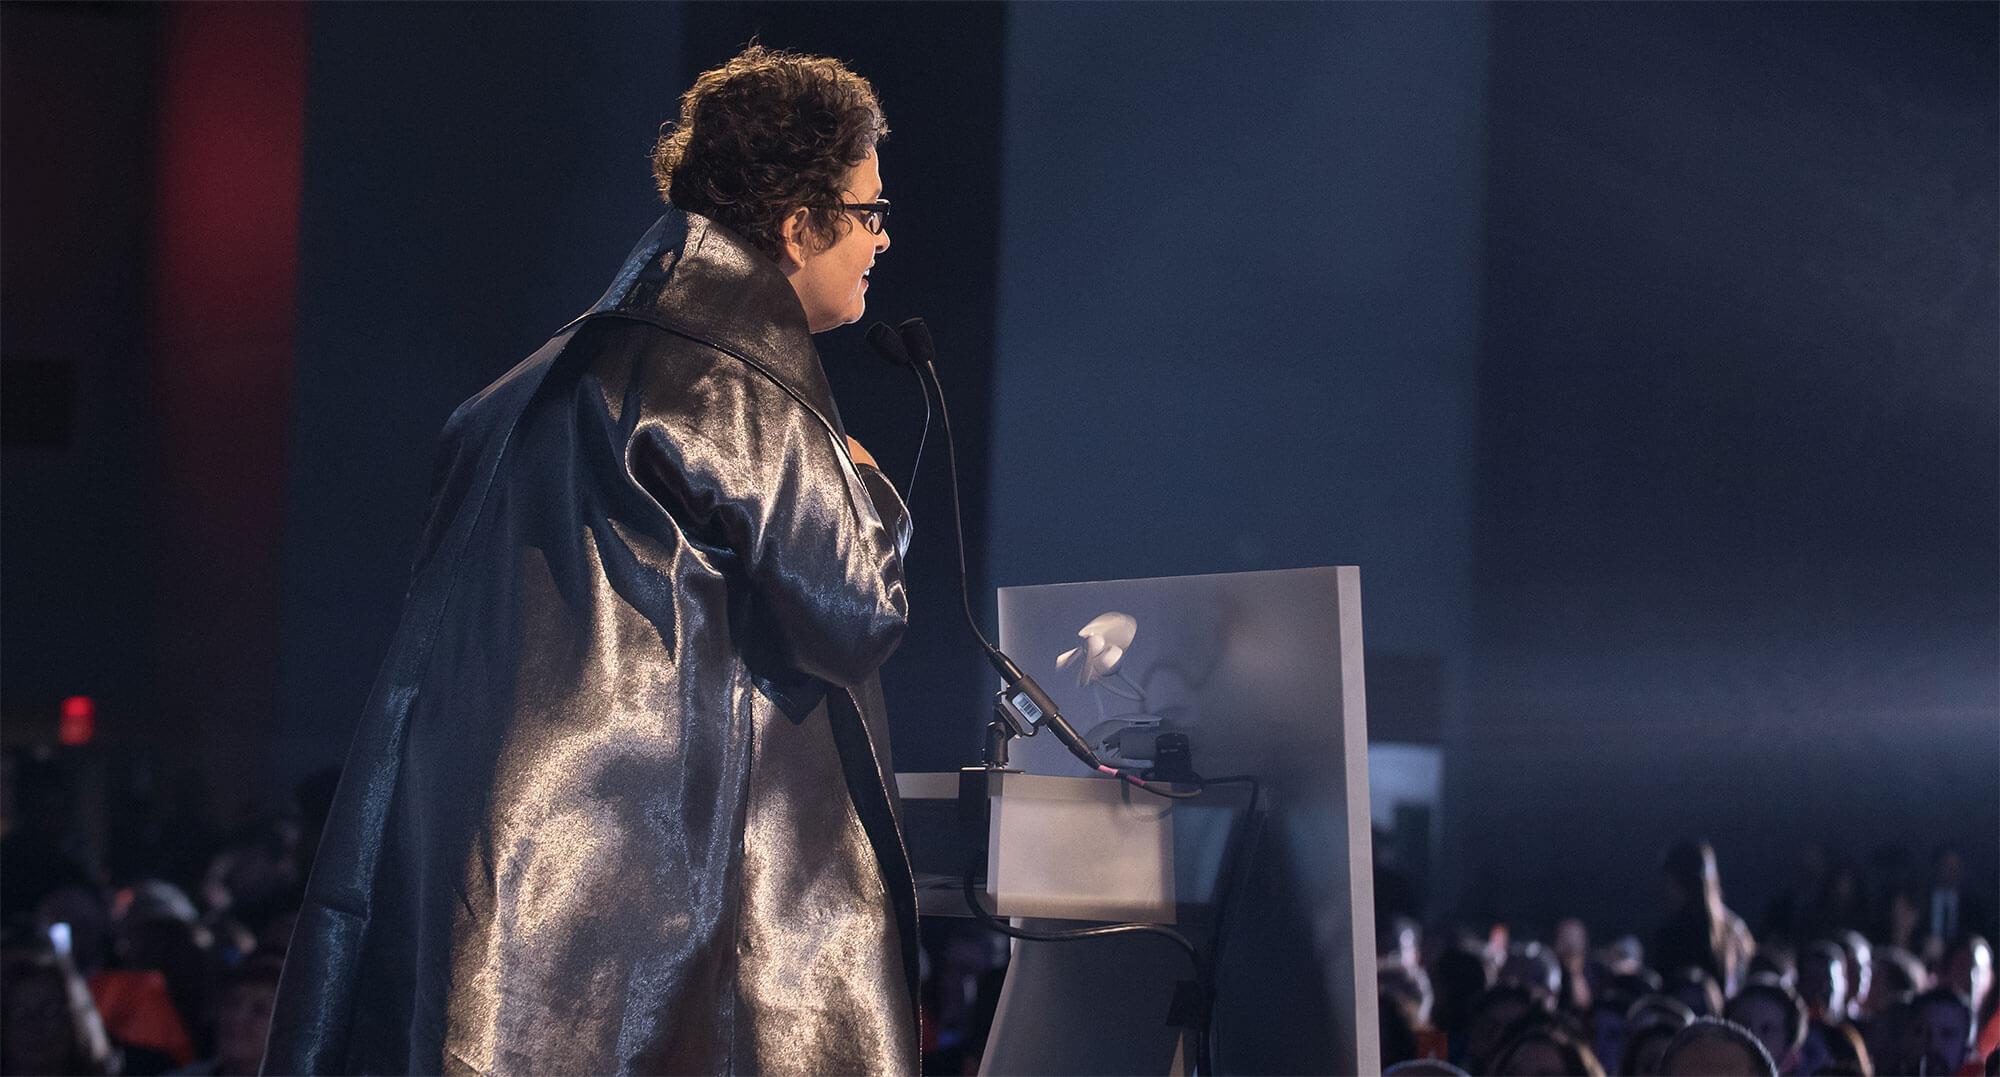 Over the shoulder shot of Cindy Allen speaking at the podium at Interior Design's Hall of Fame.